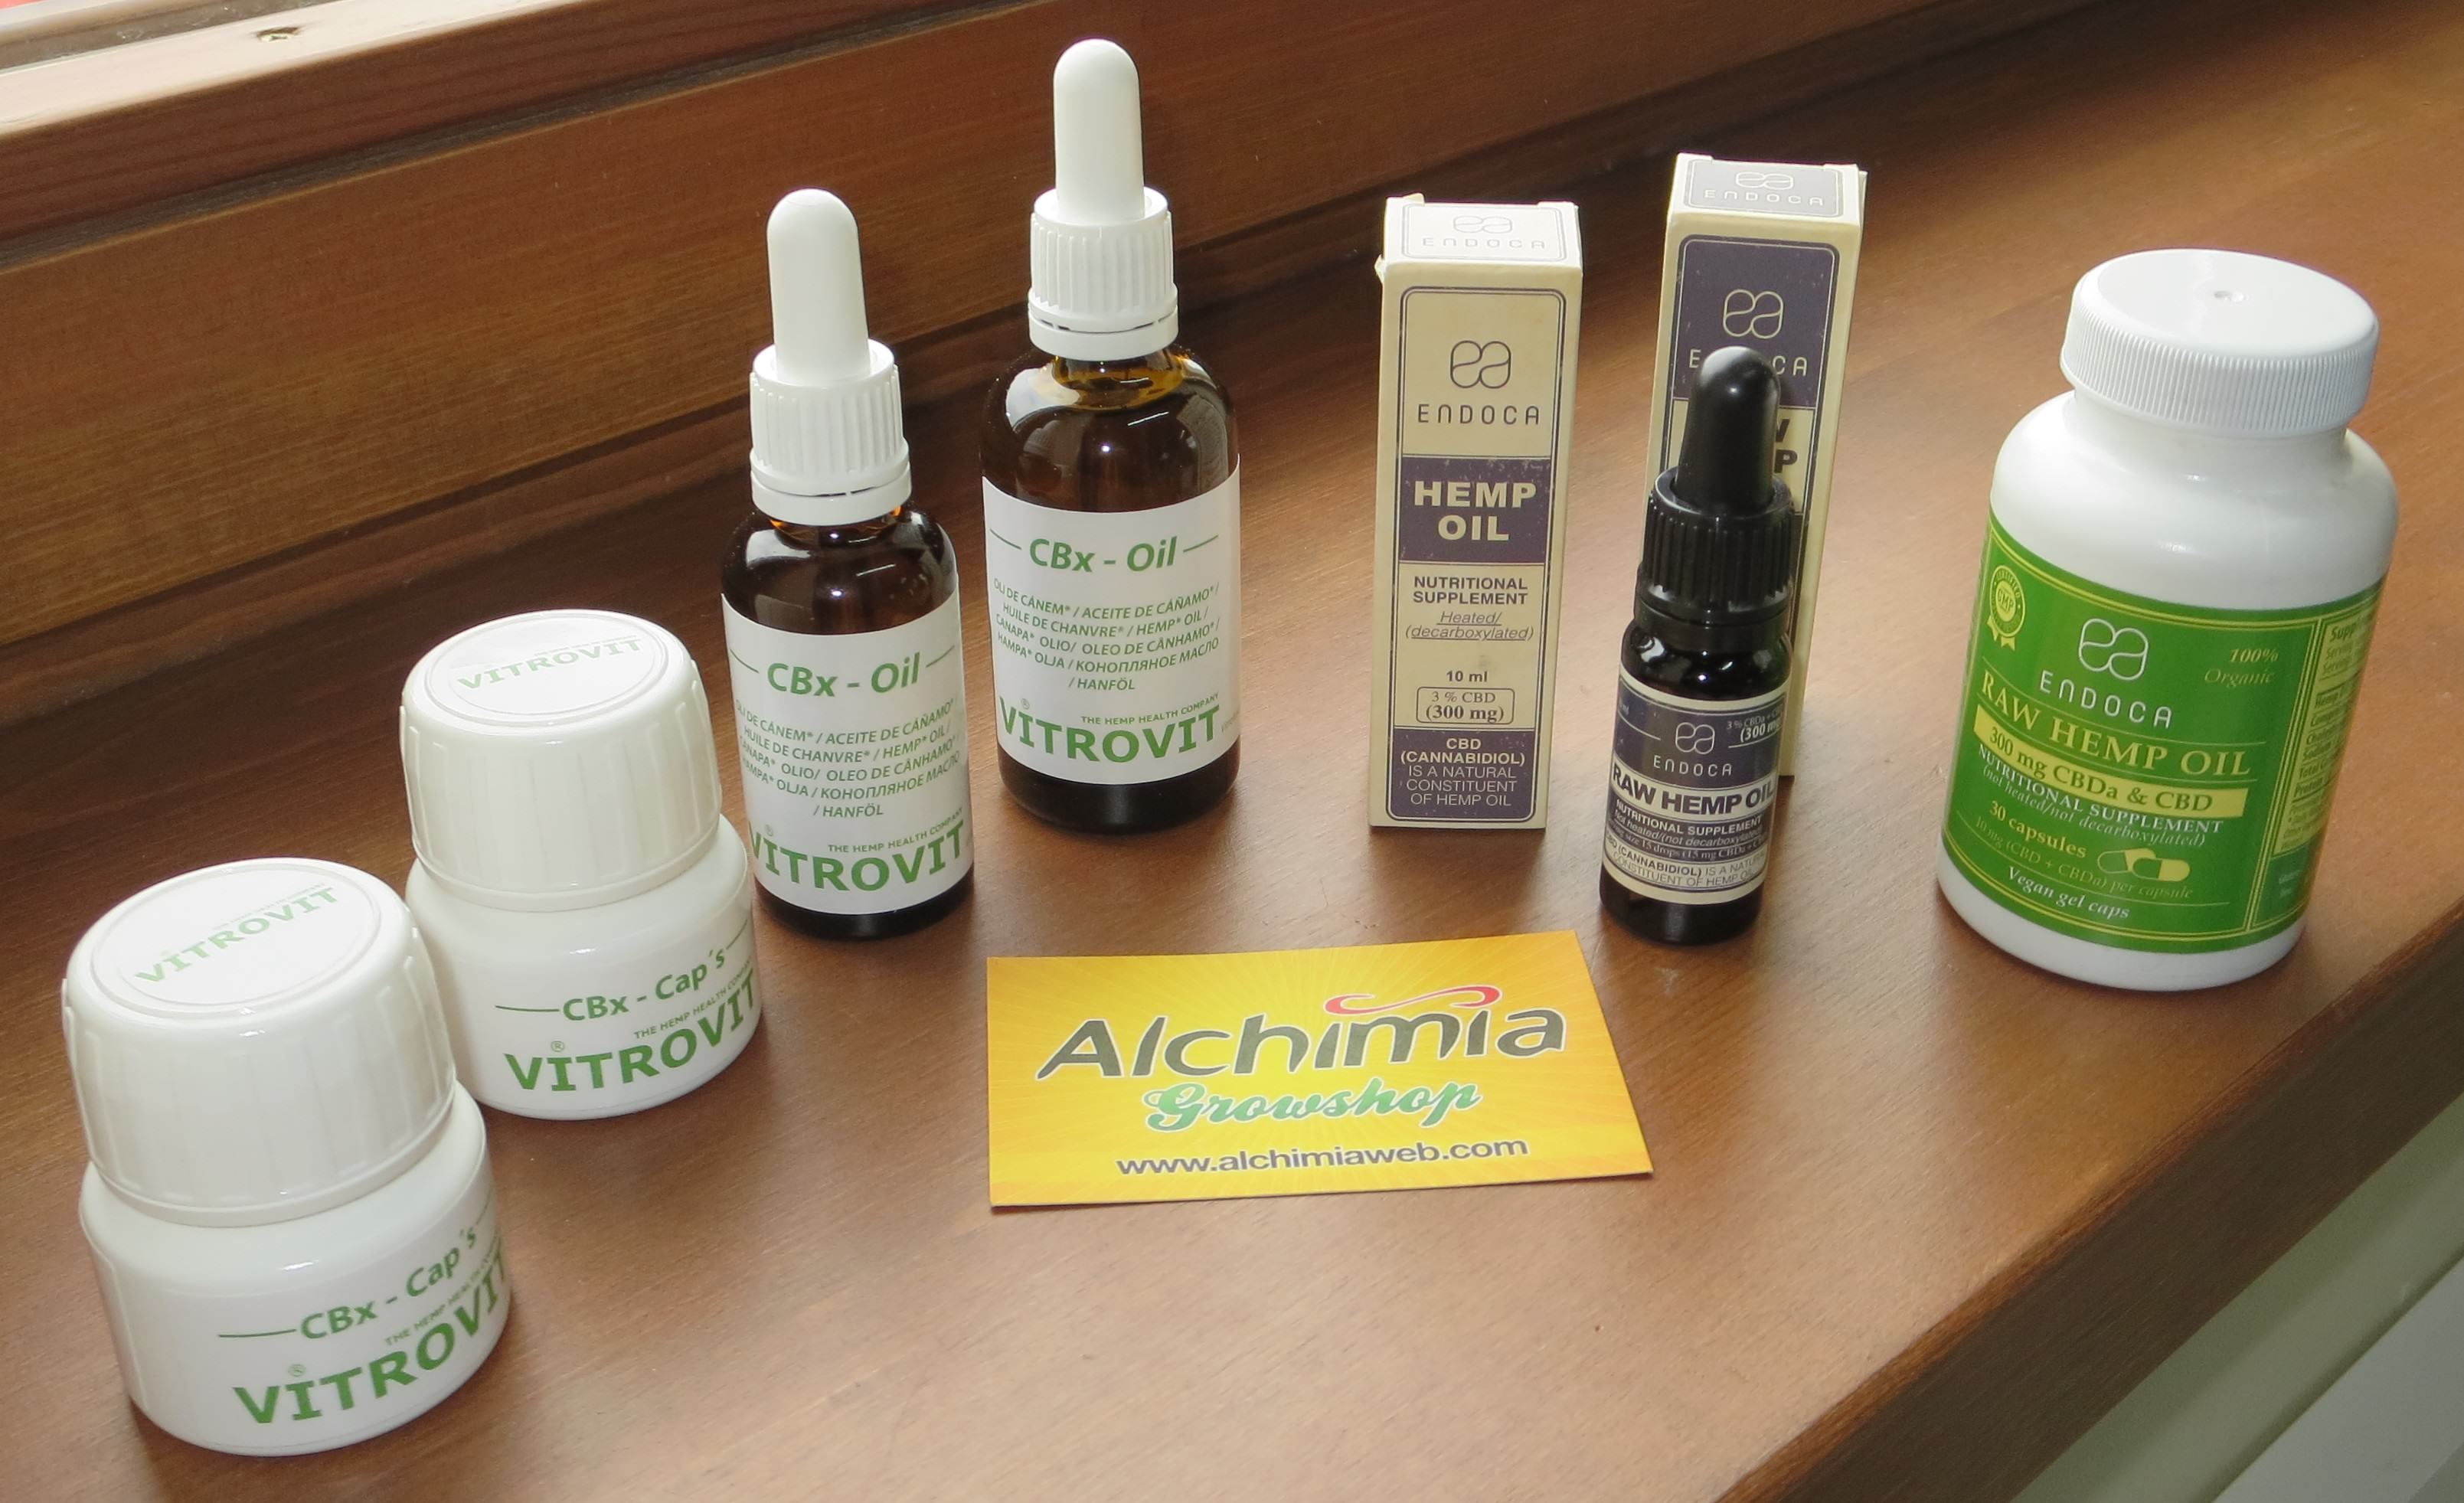 Types of cannabis oils - Alchimia blog